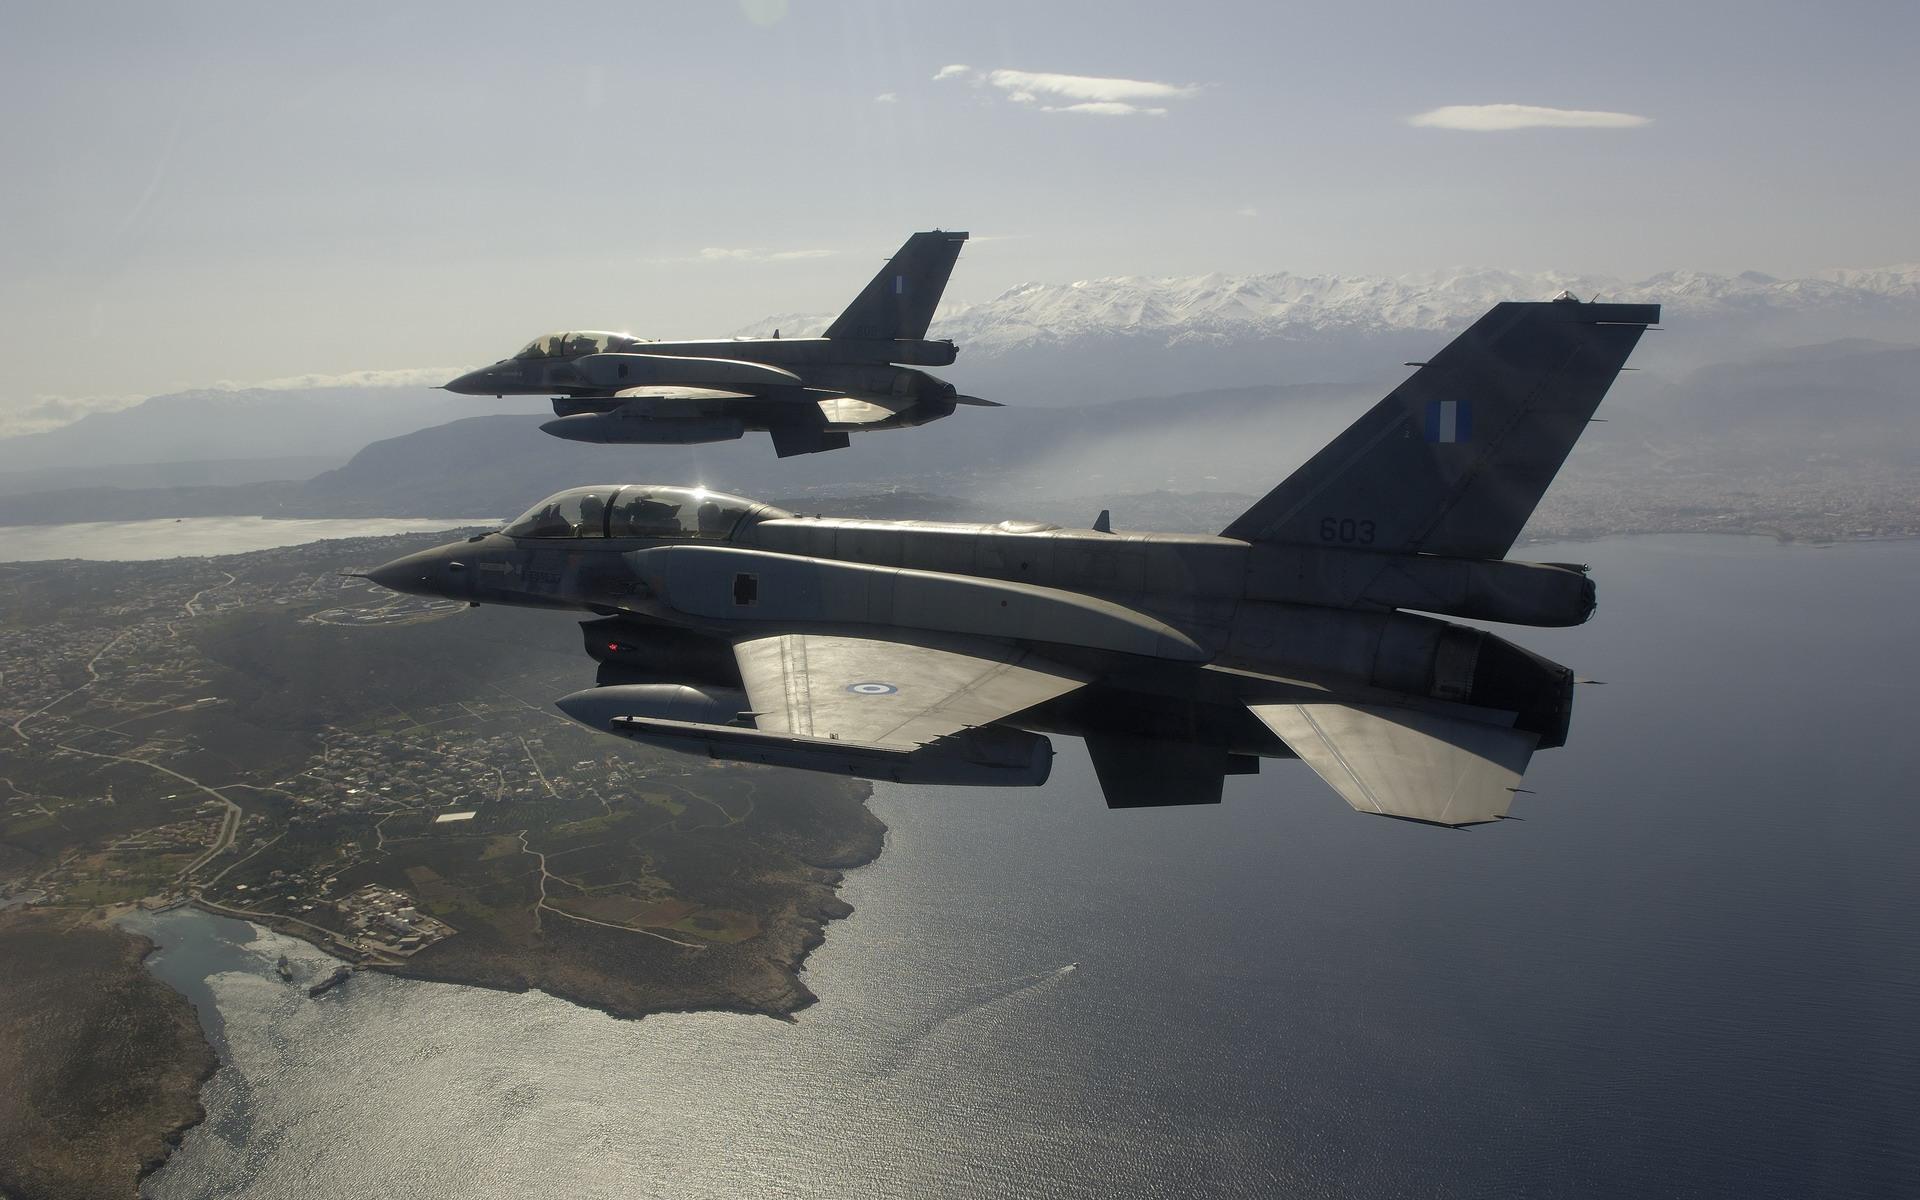 General Dynamics F16 Fighting Falcon Full HD Wallpaper - Aircraft ...